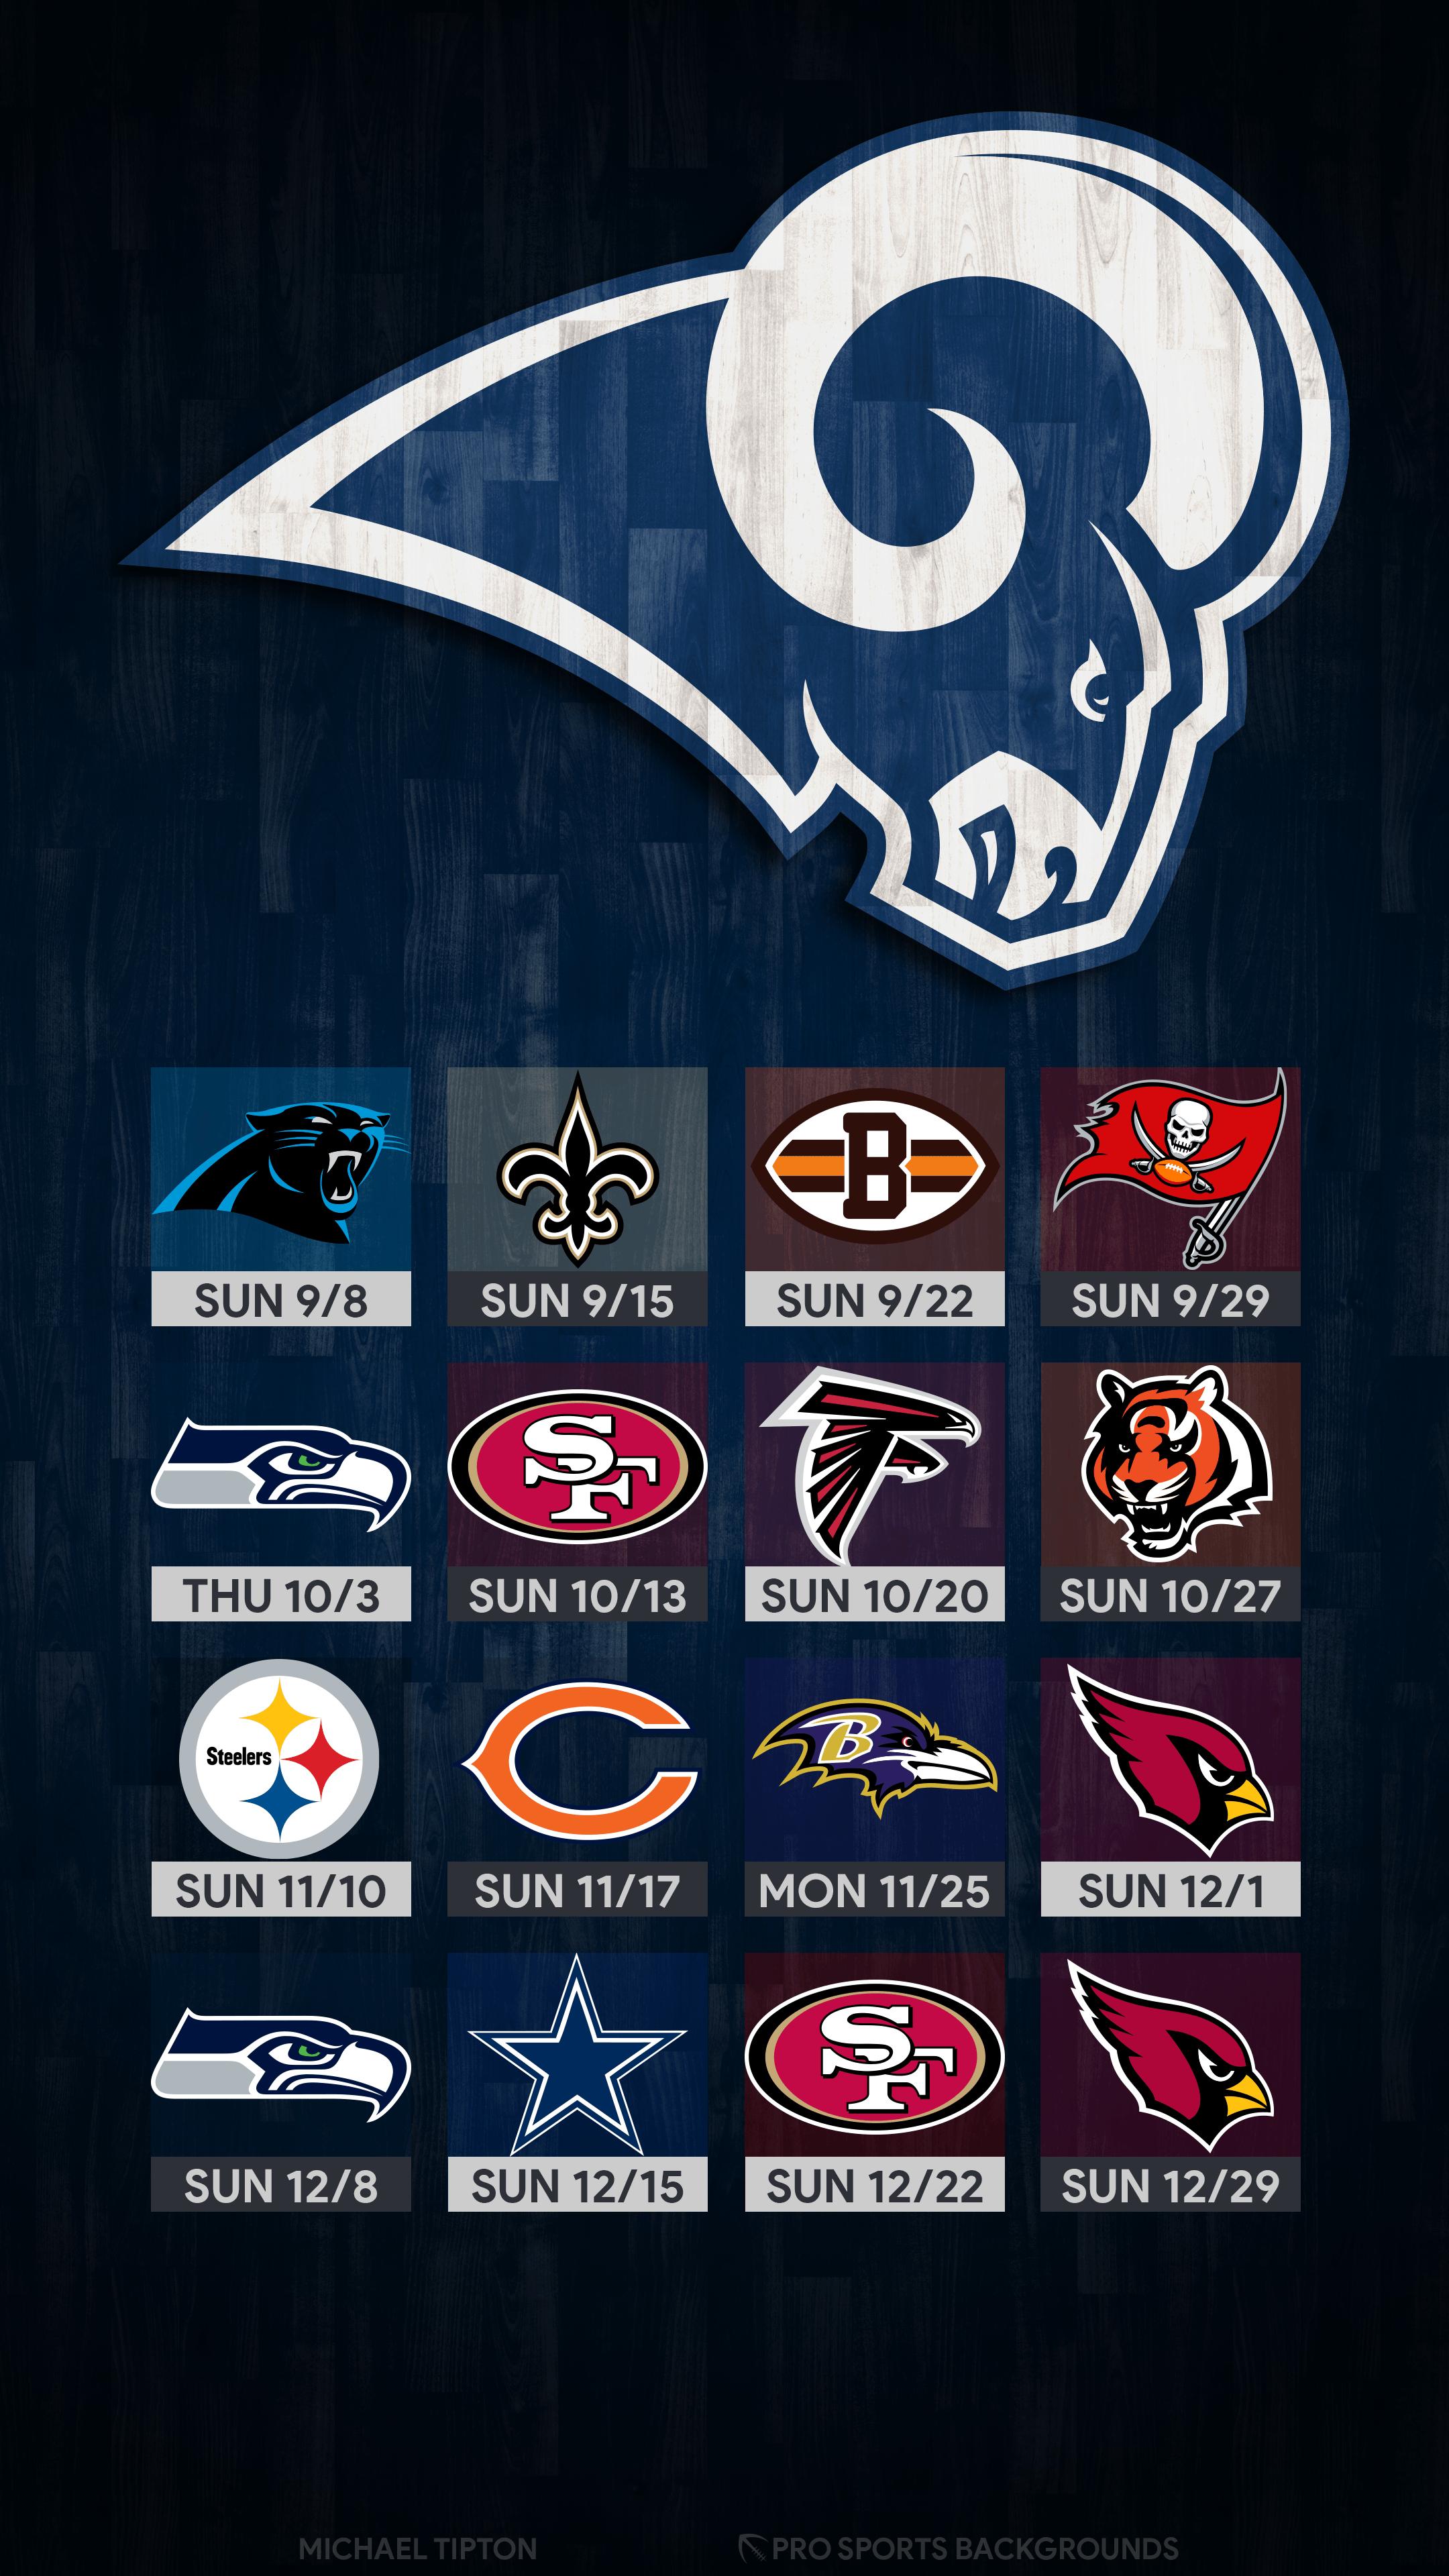 Los Angeles Rams 2019 Wallpapers